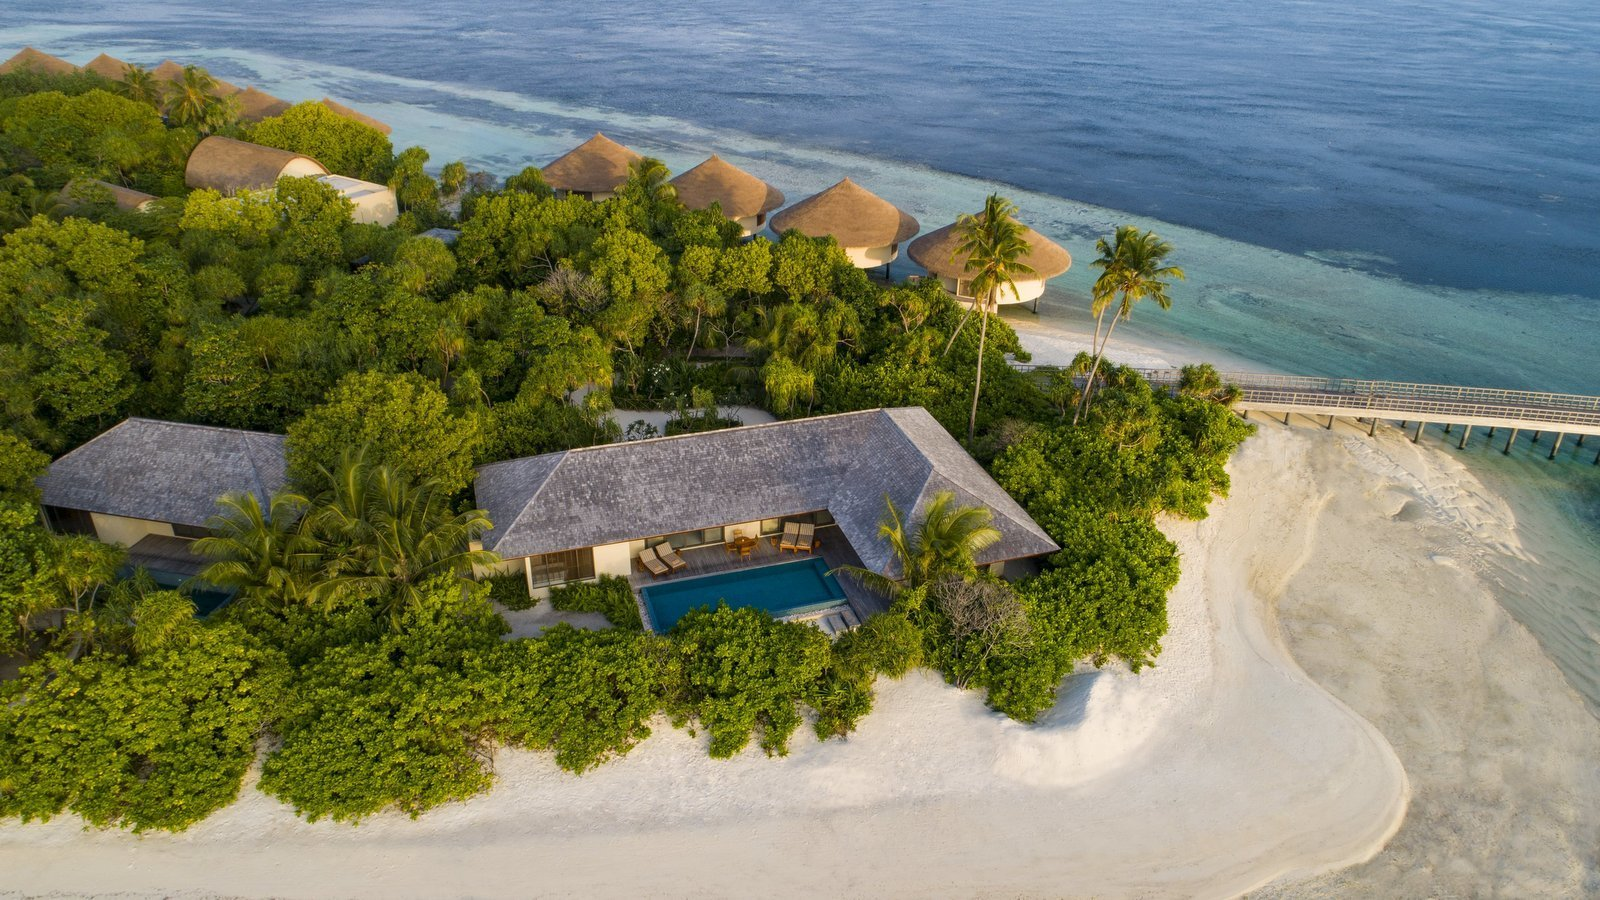 Мальдивы, отель The Residence Maldives at Dhigurah, номер Two-Bedroom Beach Pool Villa